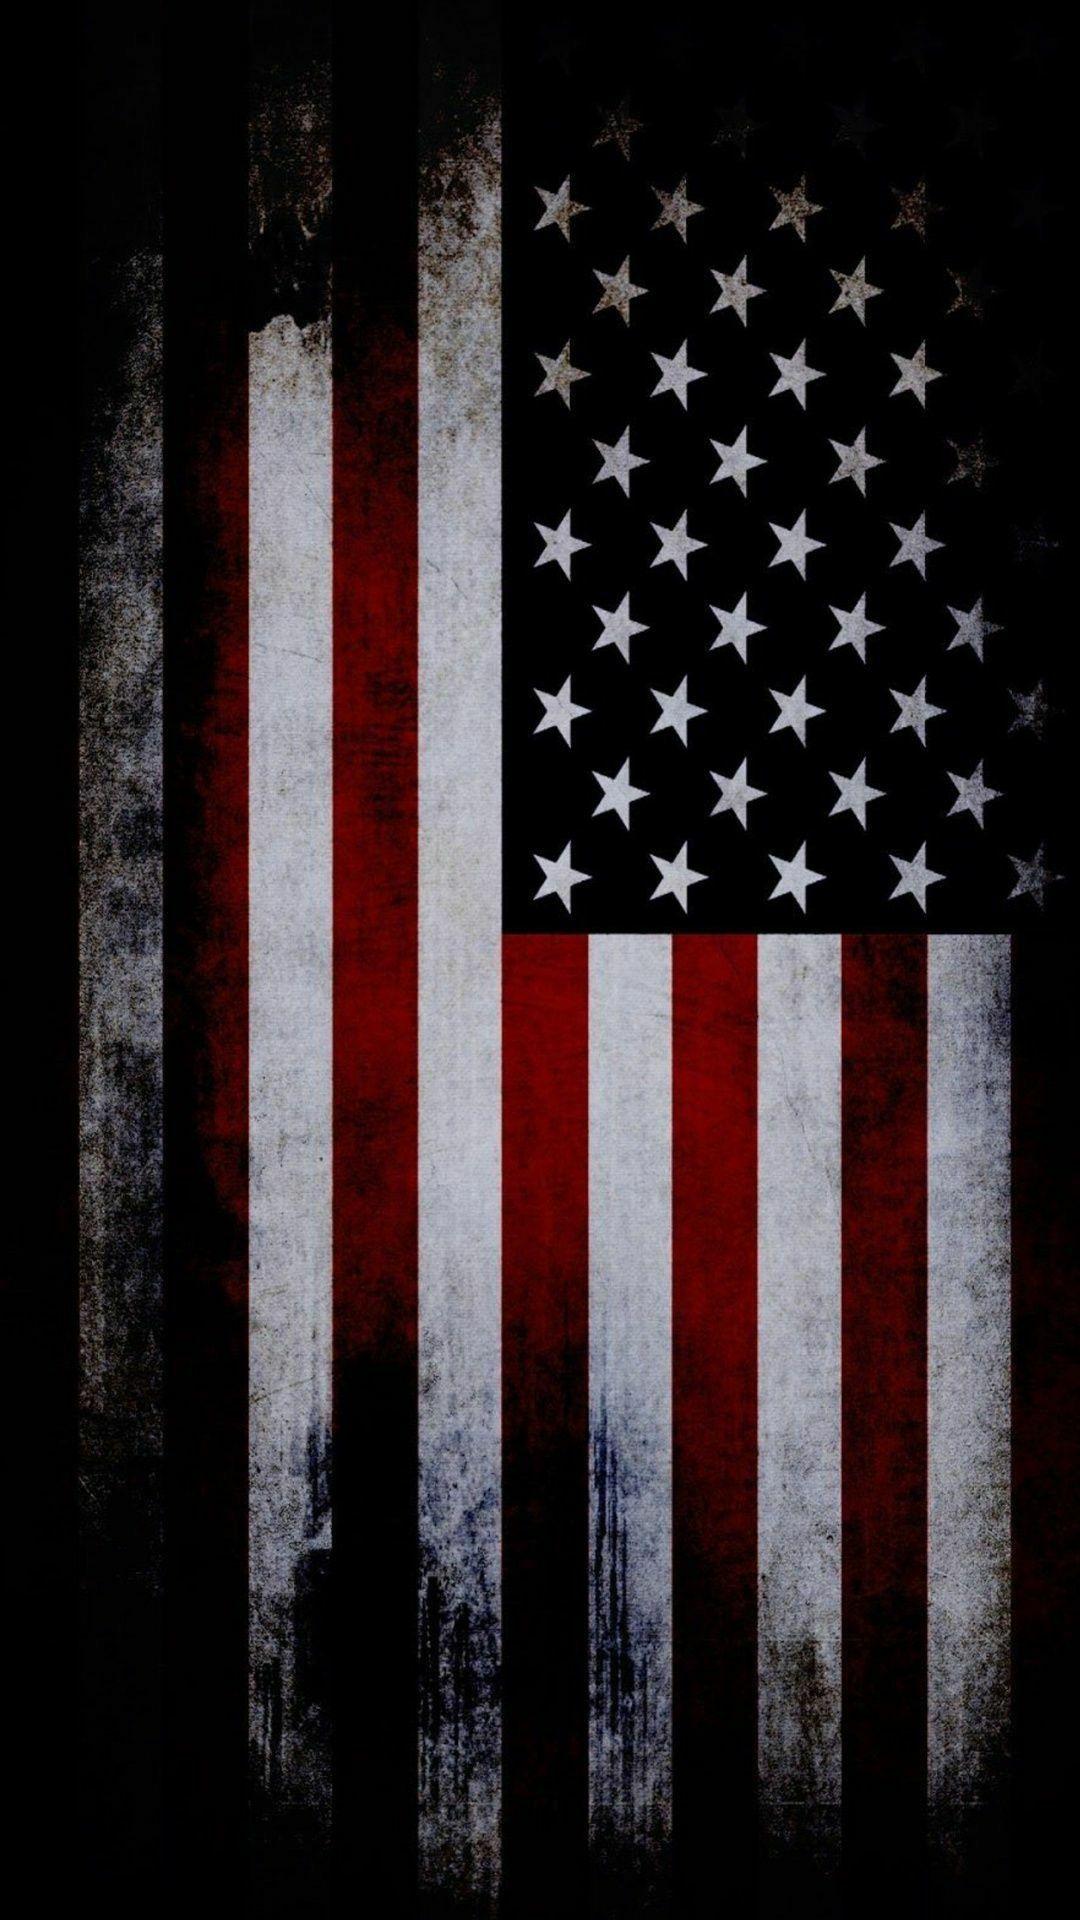 Camo Flag Wallpaper : wallpaper, Harley, Beeman, American, Wallpaper, Iphone,, Wallpaper,, America